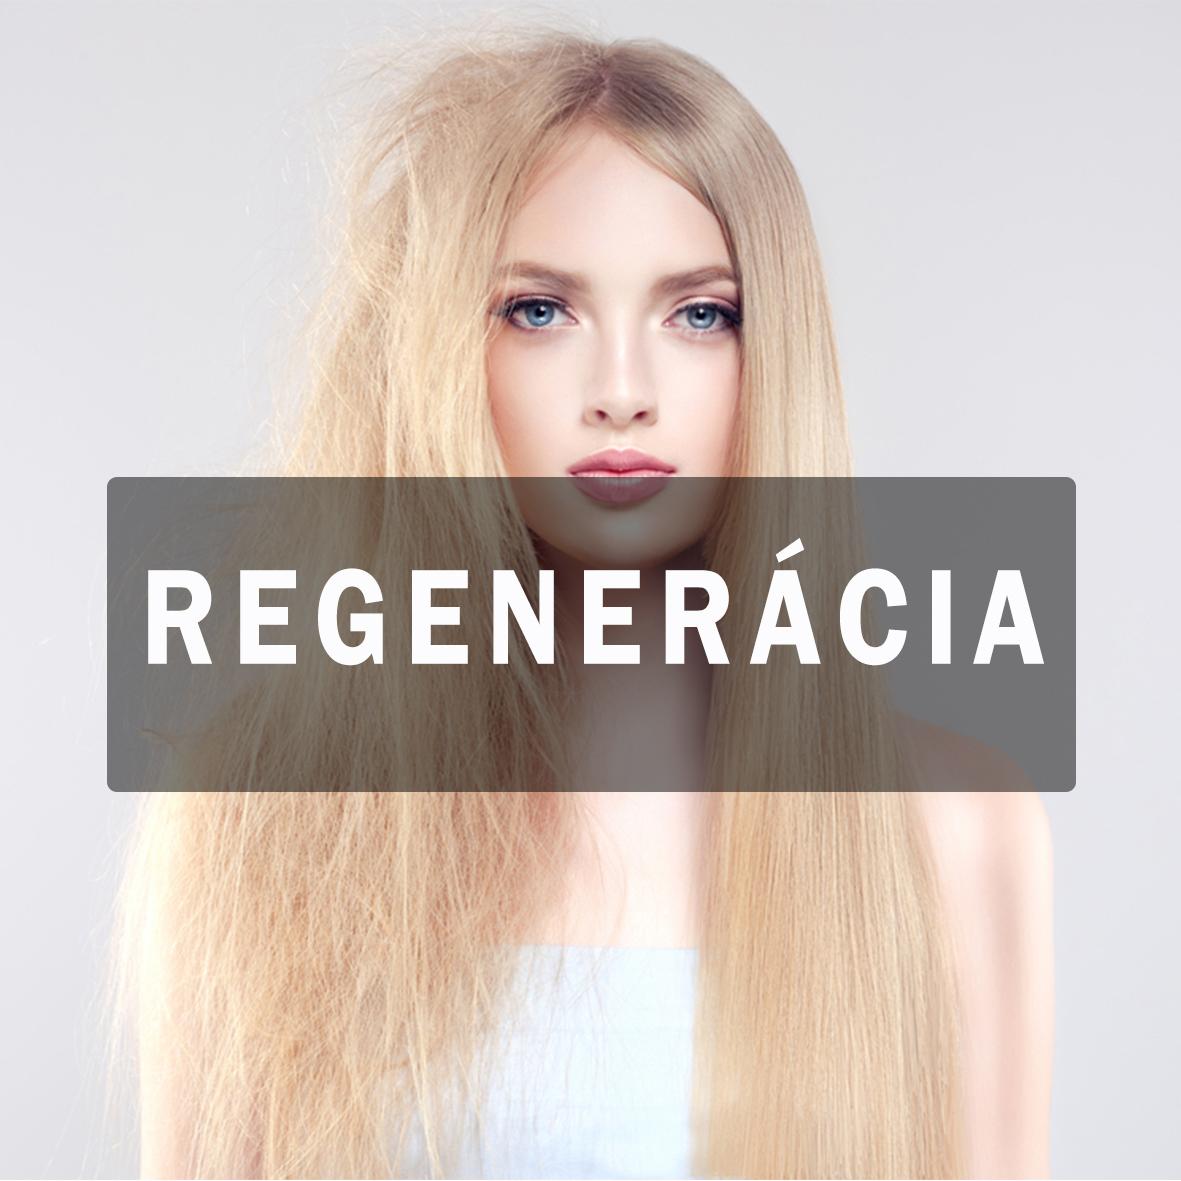 Regenerácia